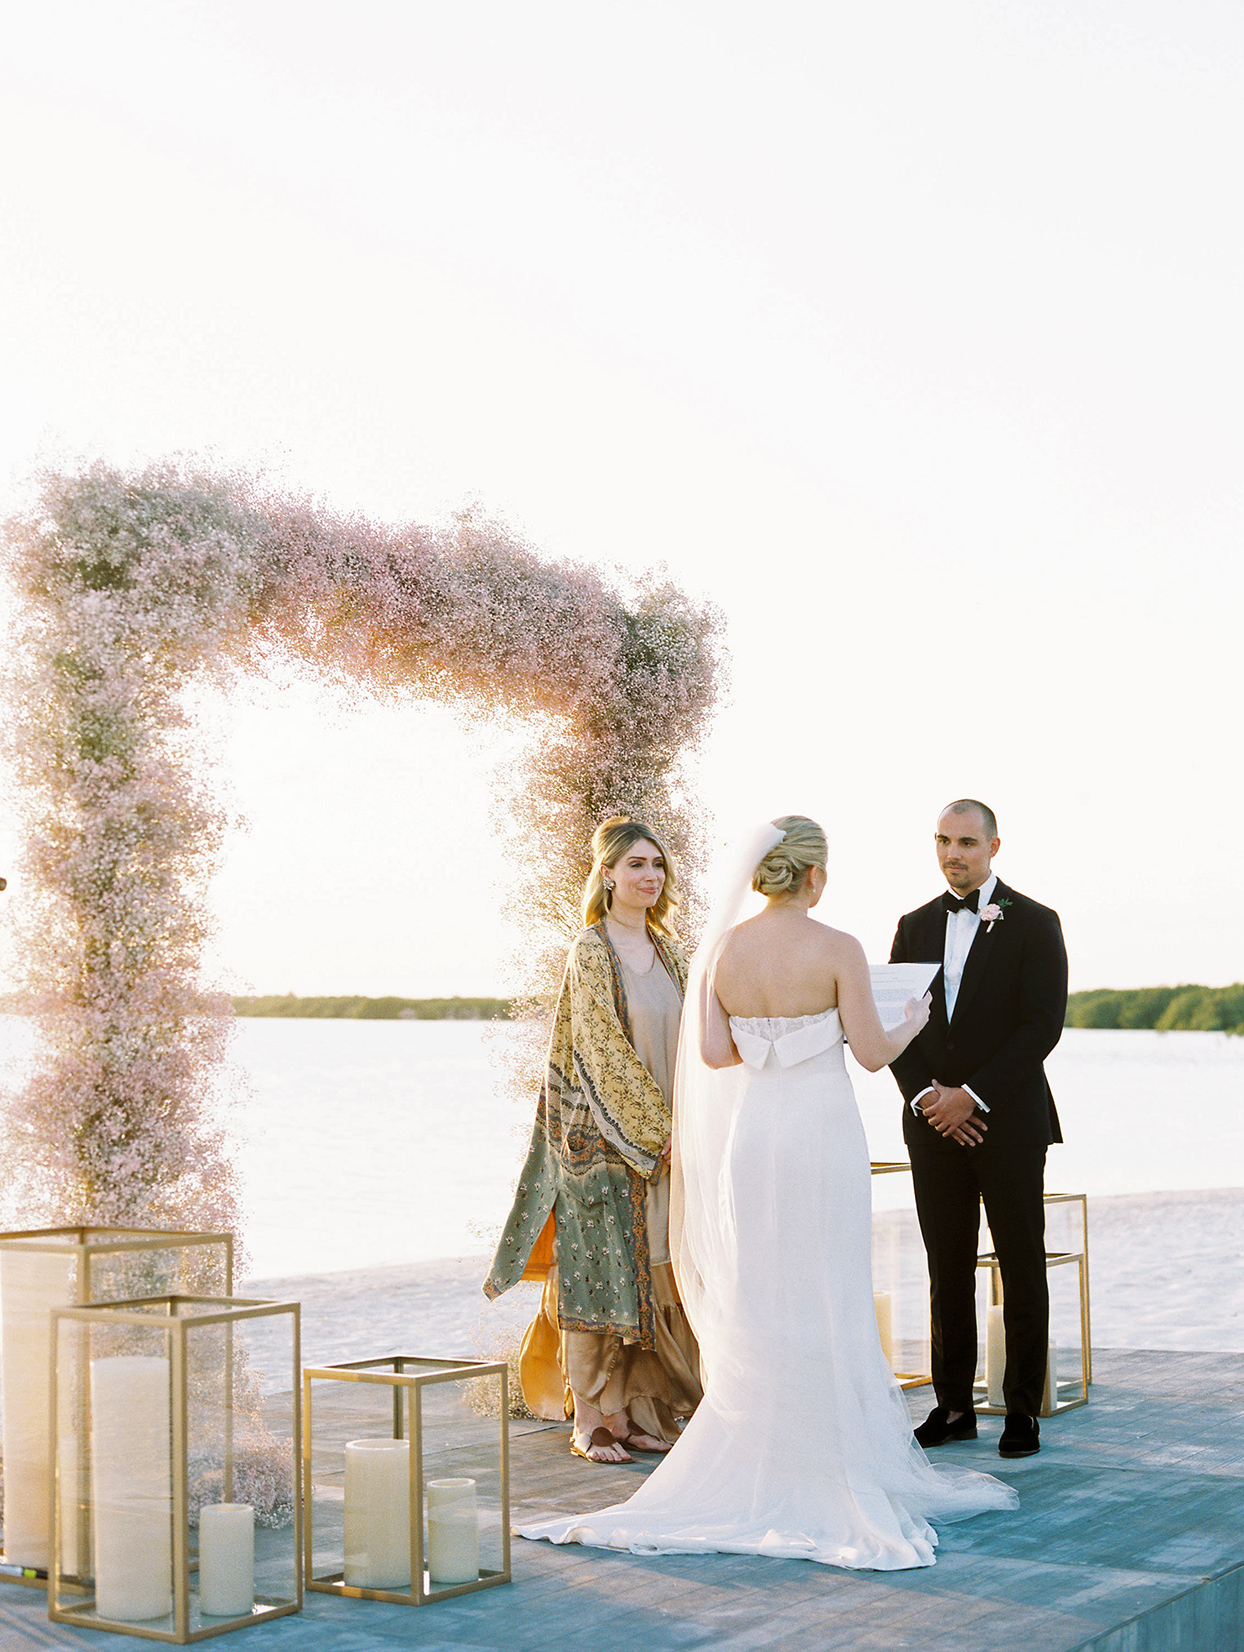 katie nick wedding vows by water